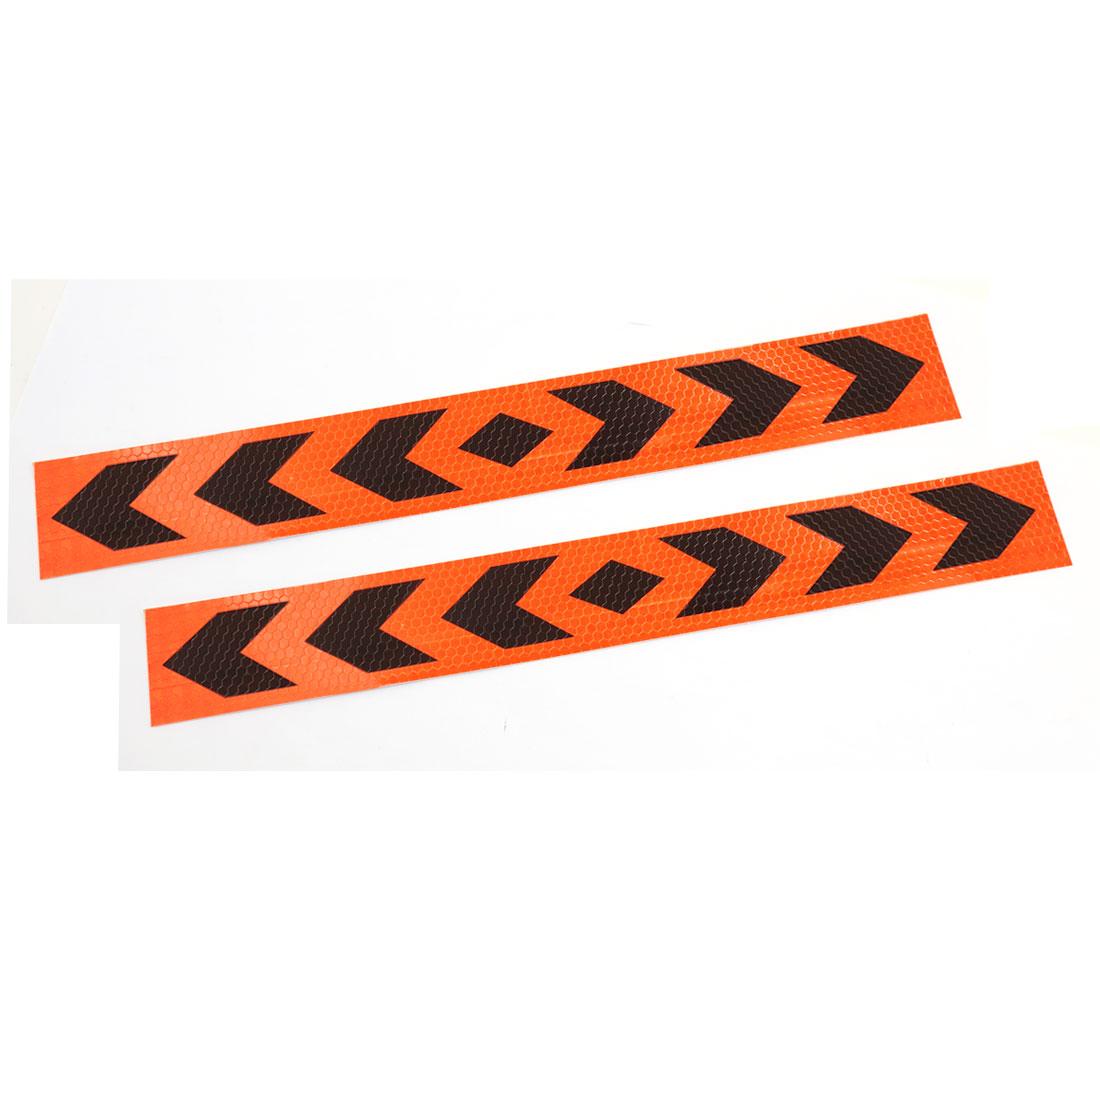 Orange Black Arrows Printed Adhesive Car Sticker Reflective Exterior Decals 2PCS